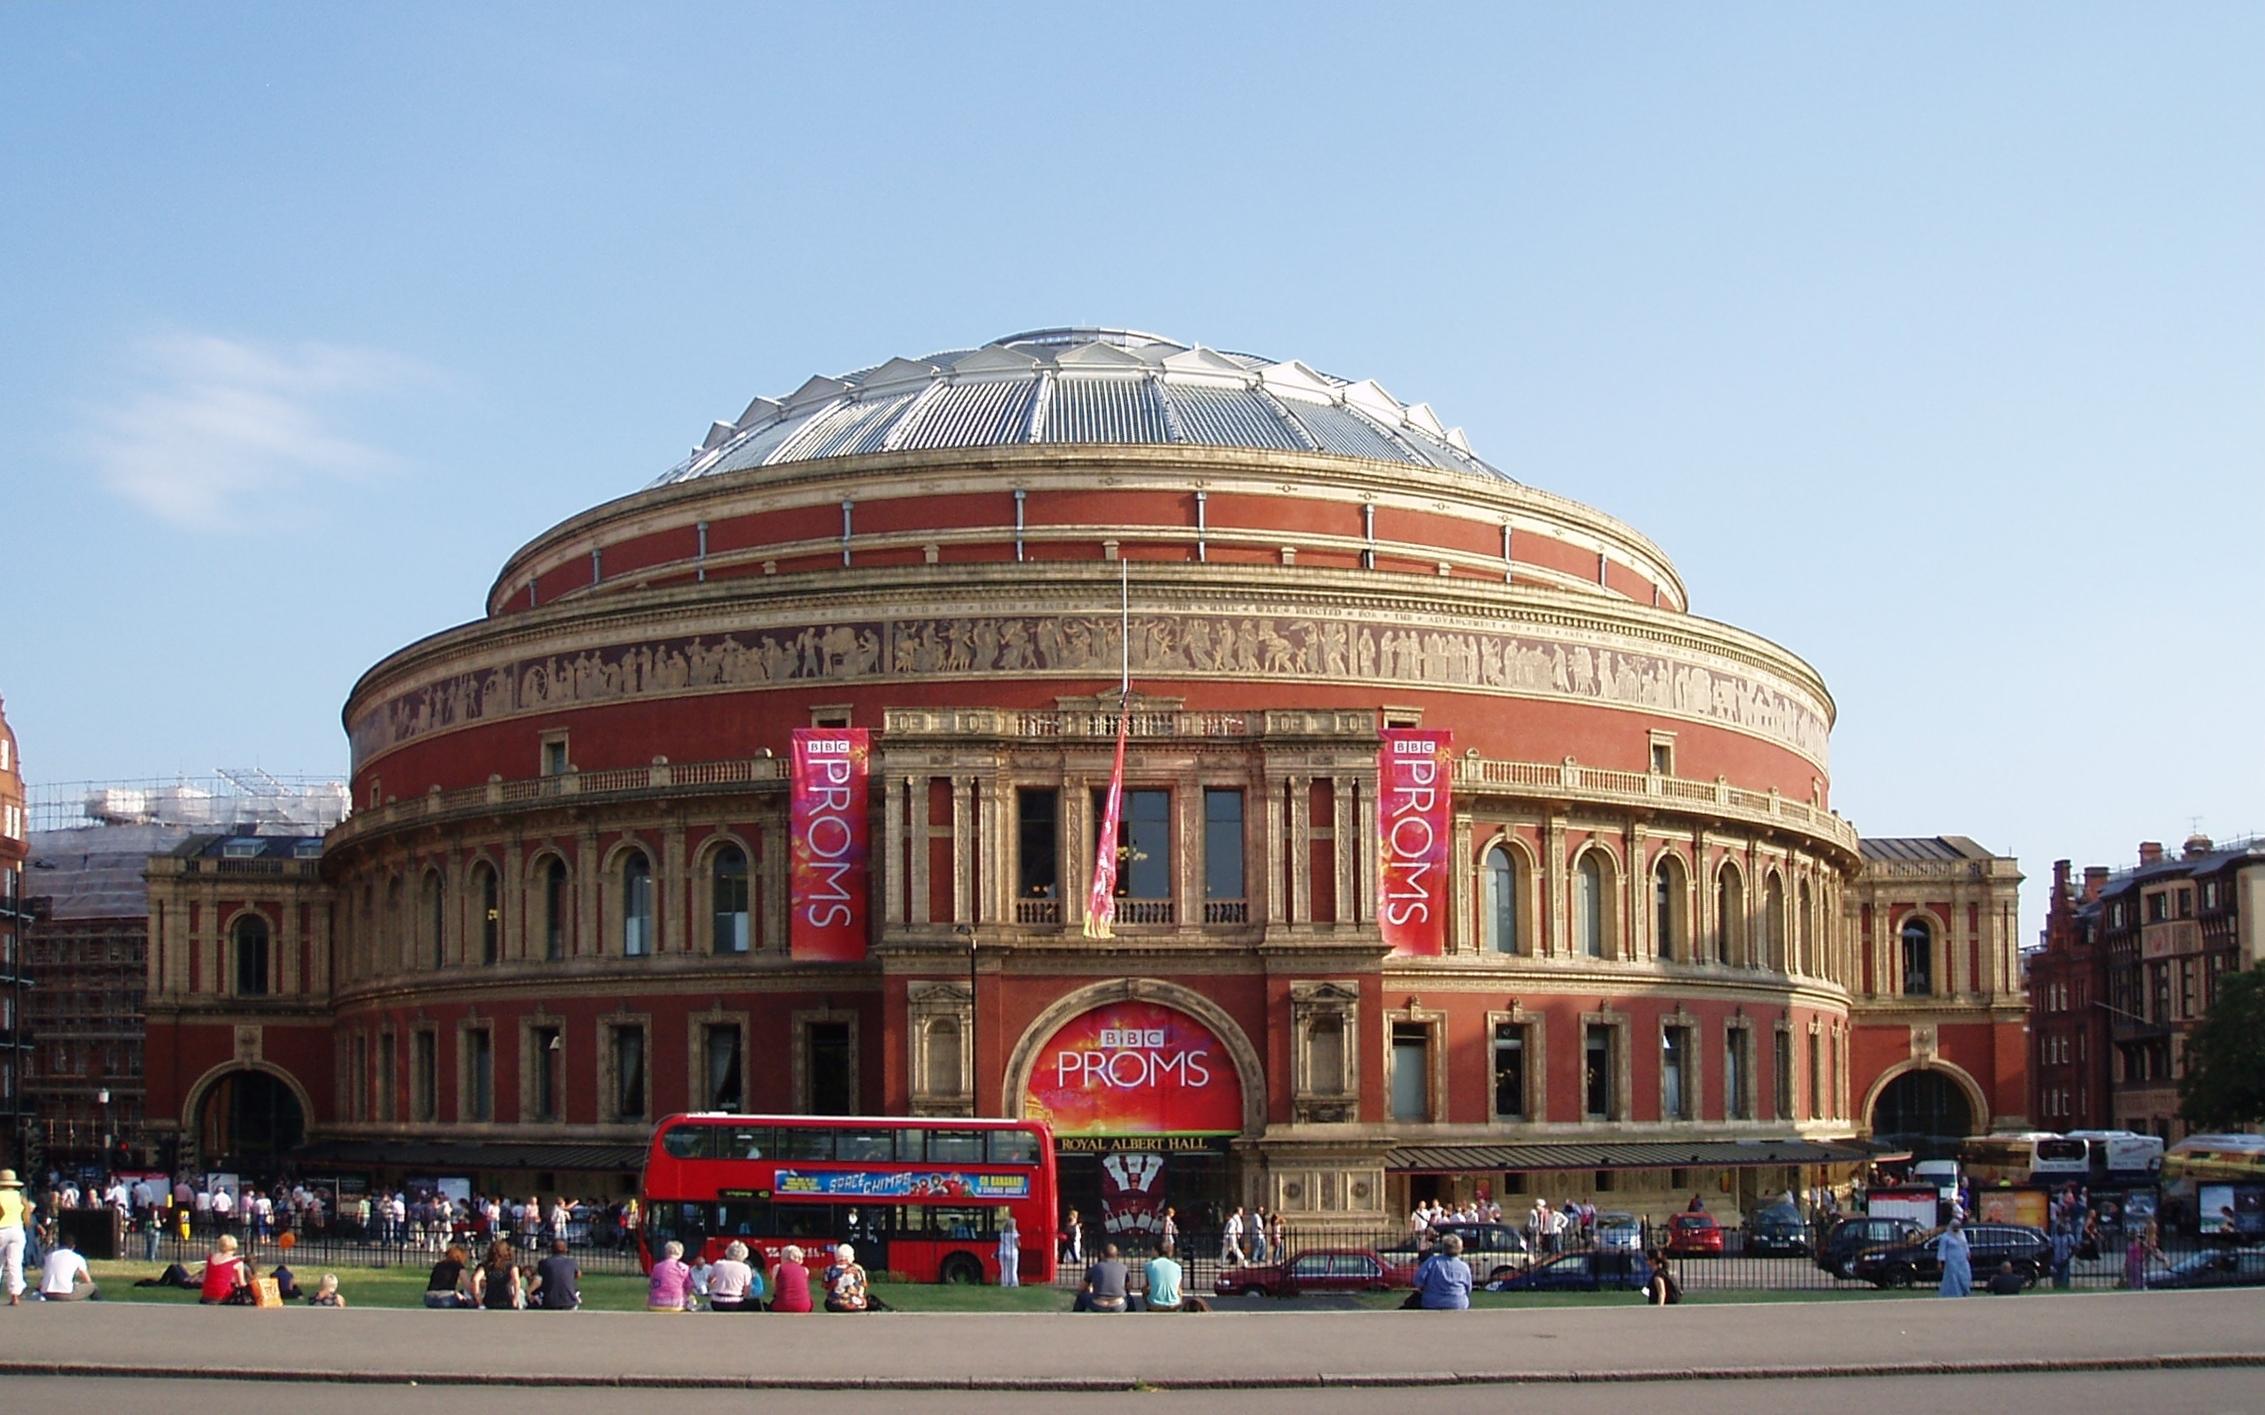 The Proms - Wikipedia